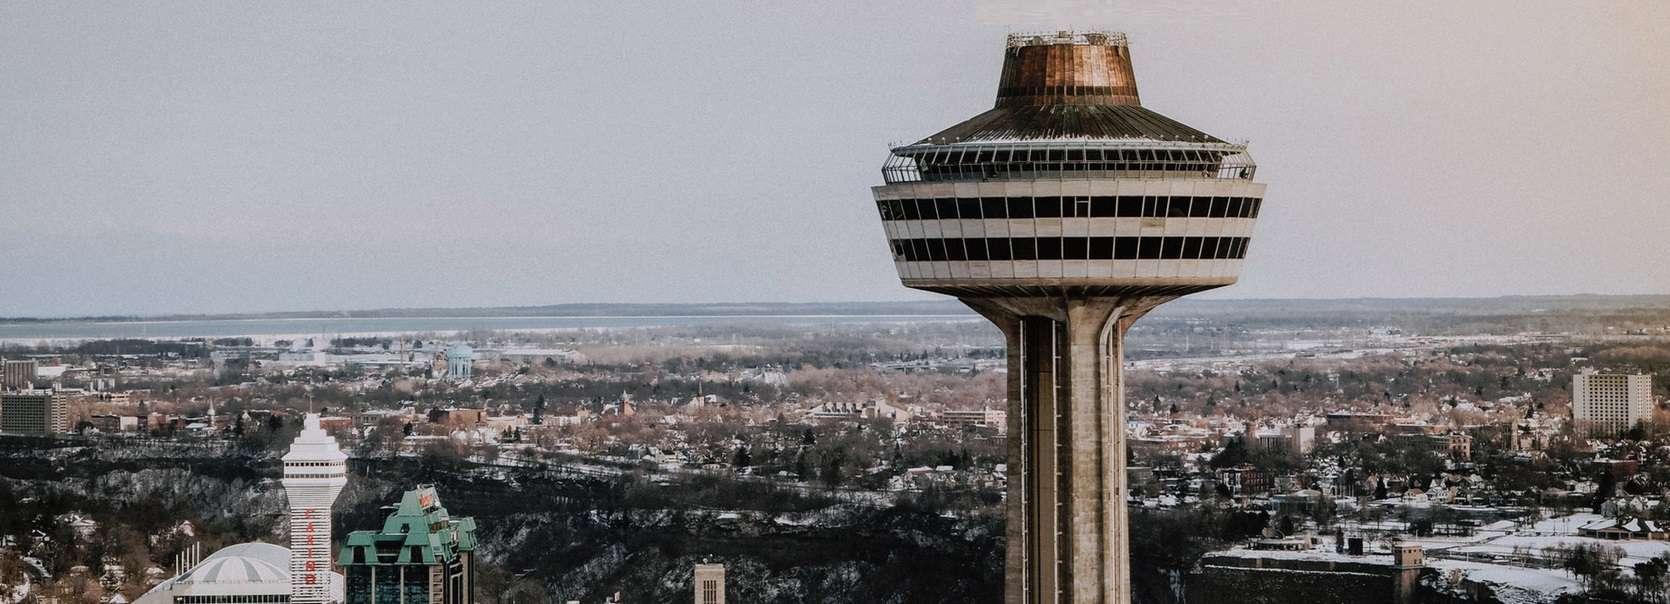 Skylon Tower in Niagara Falls